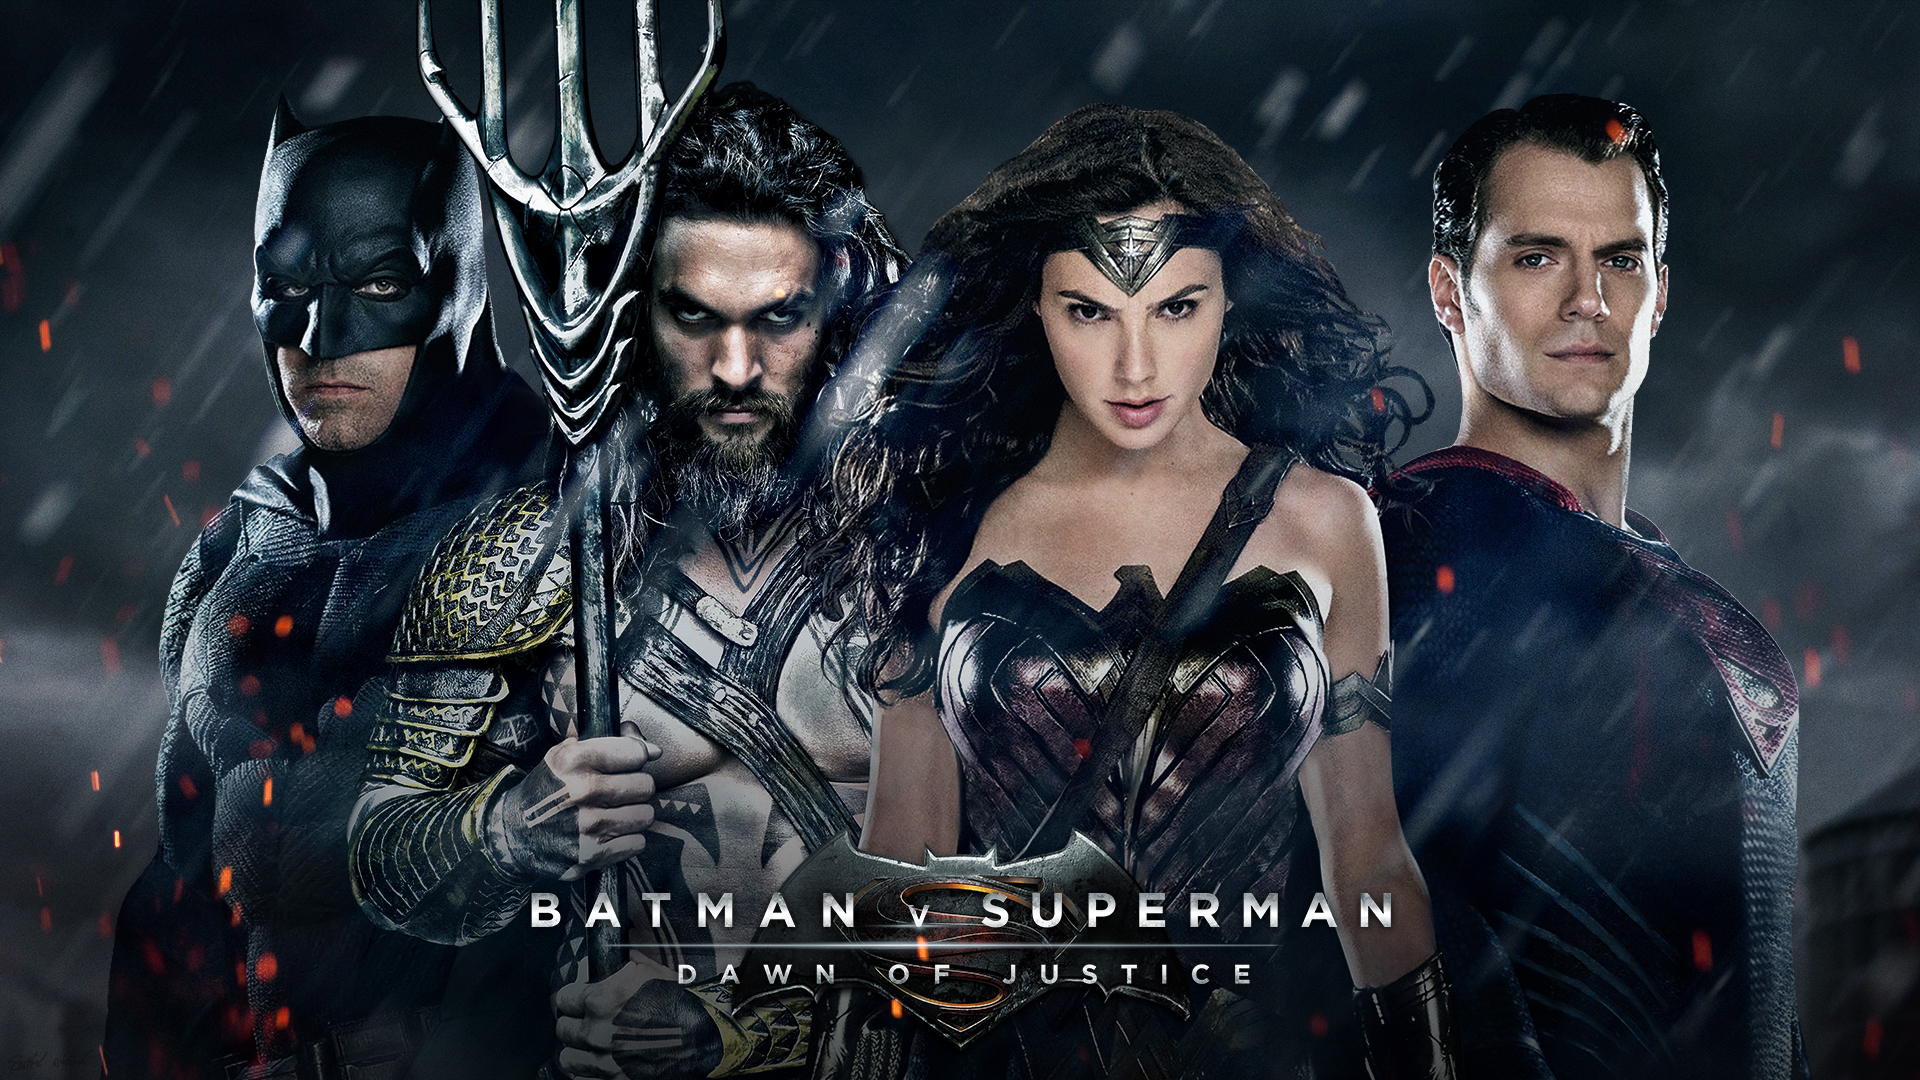 Warner Bros. Pulls Zack Snyder, Replaces with Geoff Johns & Jon Berg